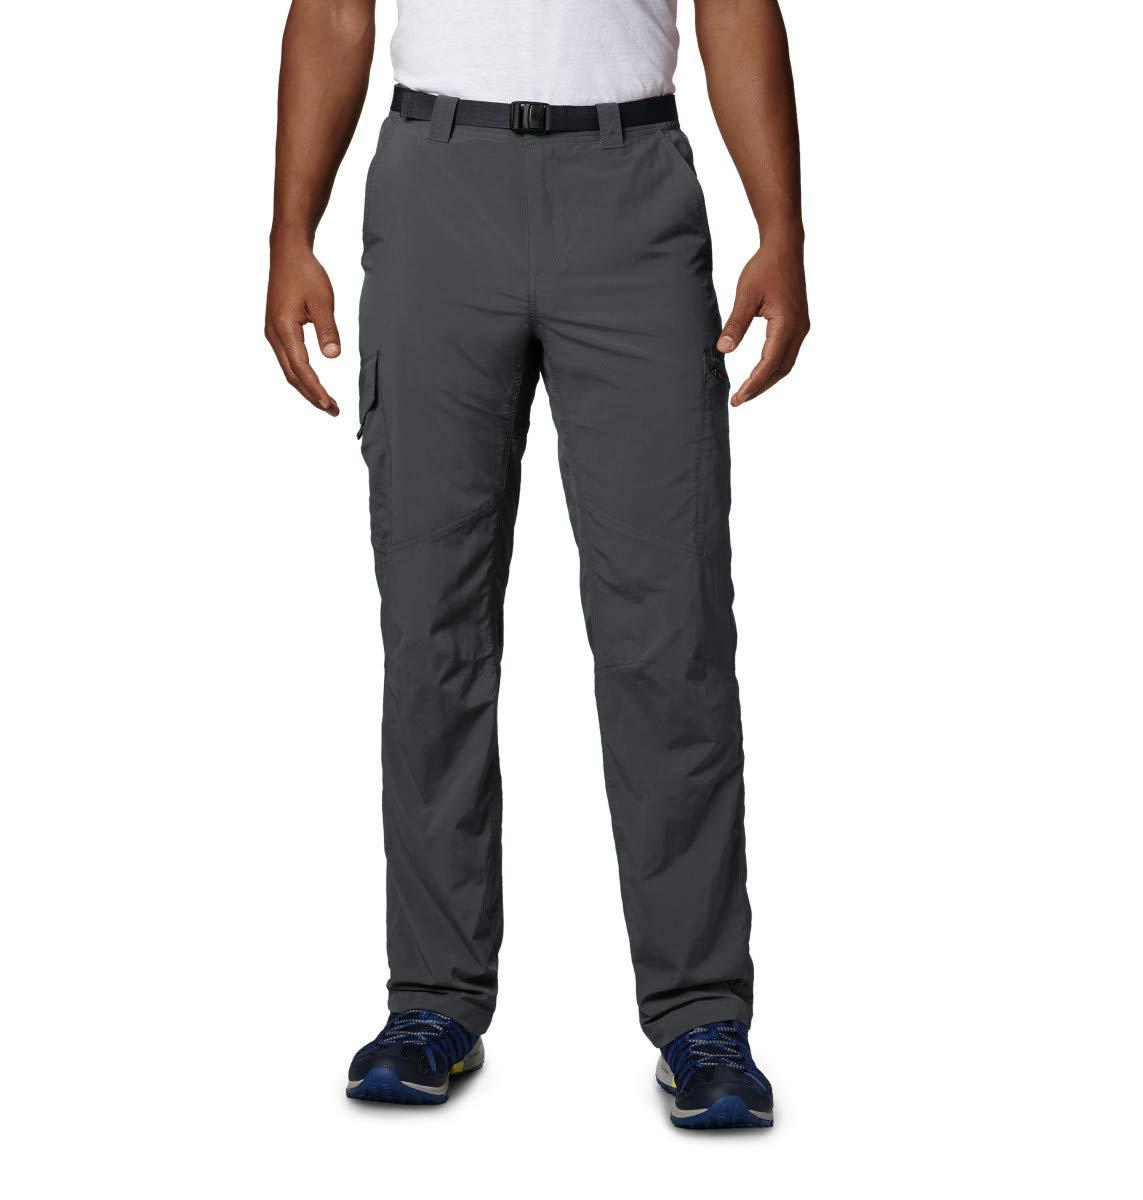 Columbia Men's  Men's Silver Ridge Cargo Pant , Grill, 40x30 by Columbia